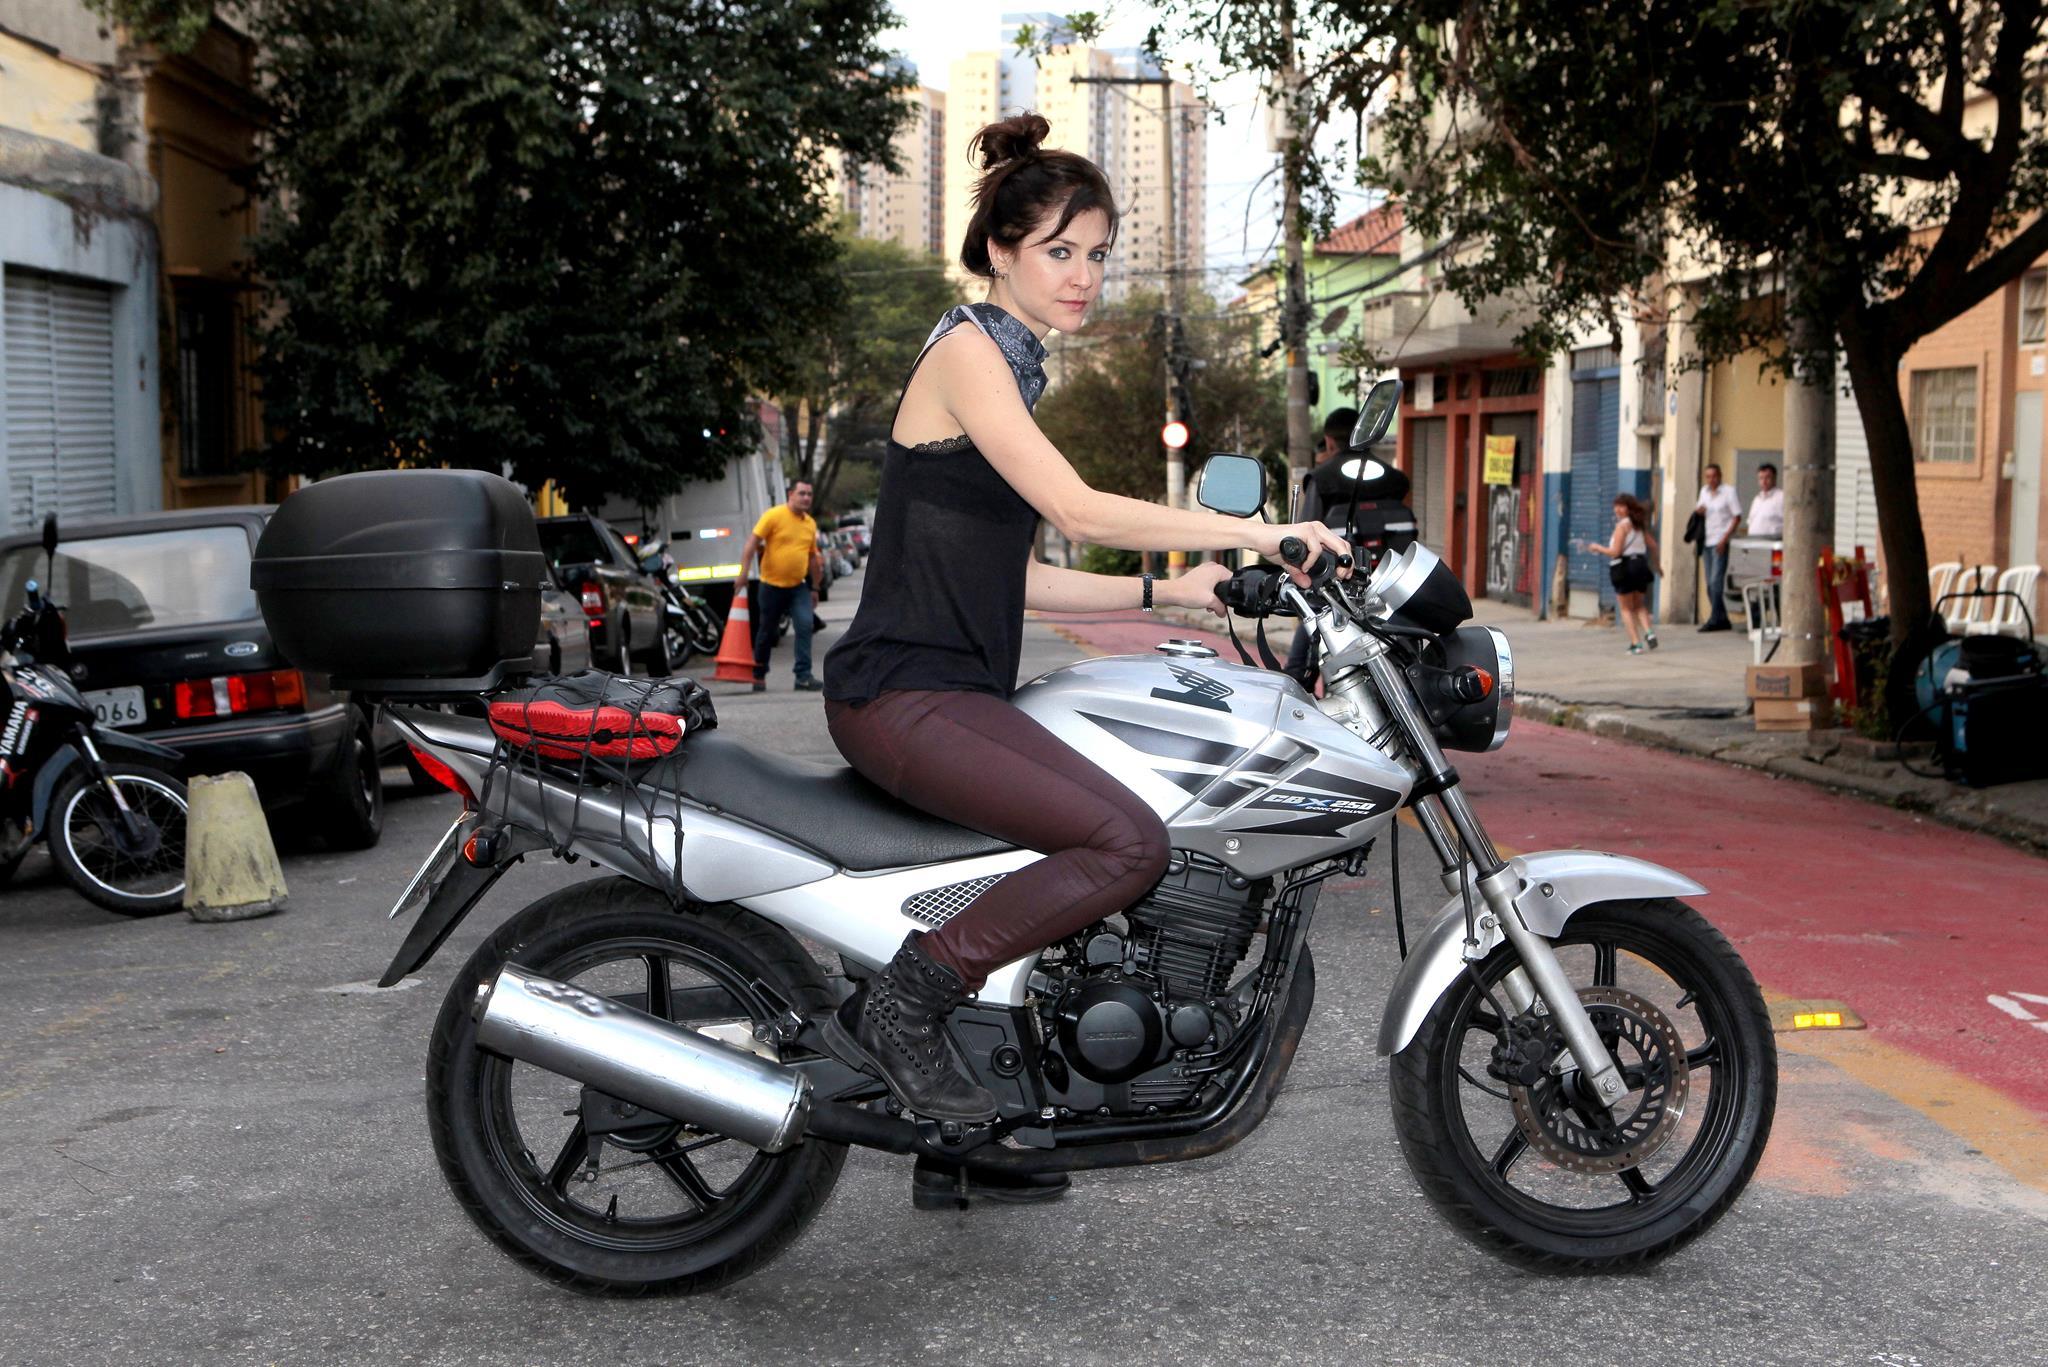 Chris Ubach vive a protagonista de 'A Garota da Moto' (Foto: Lourival Ribeiro/SBT)